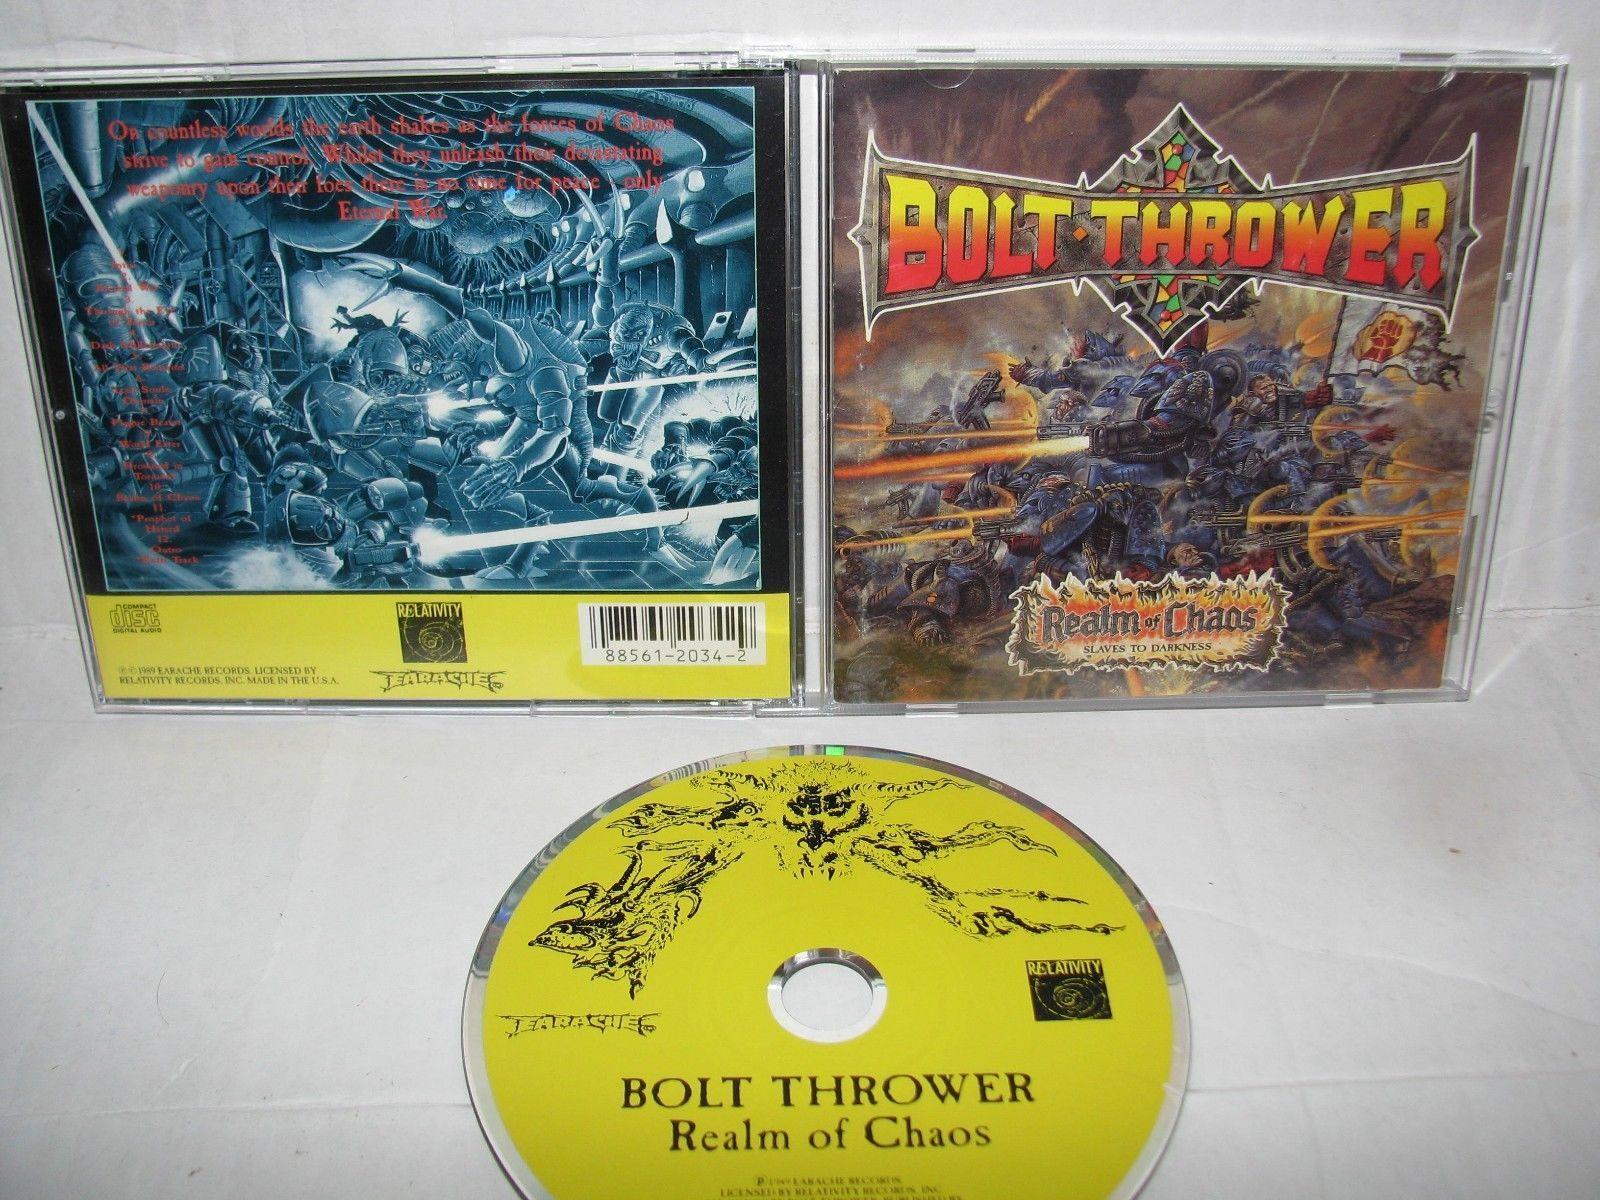 Bolt Thrower - realm of chaos CD ORIGINAL RELATIVITY 1989  https://t.co/ArA76Zq5Xq https://t.co/gep9oxGuhh